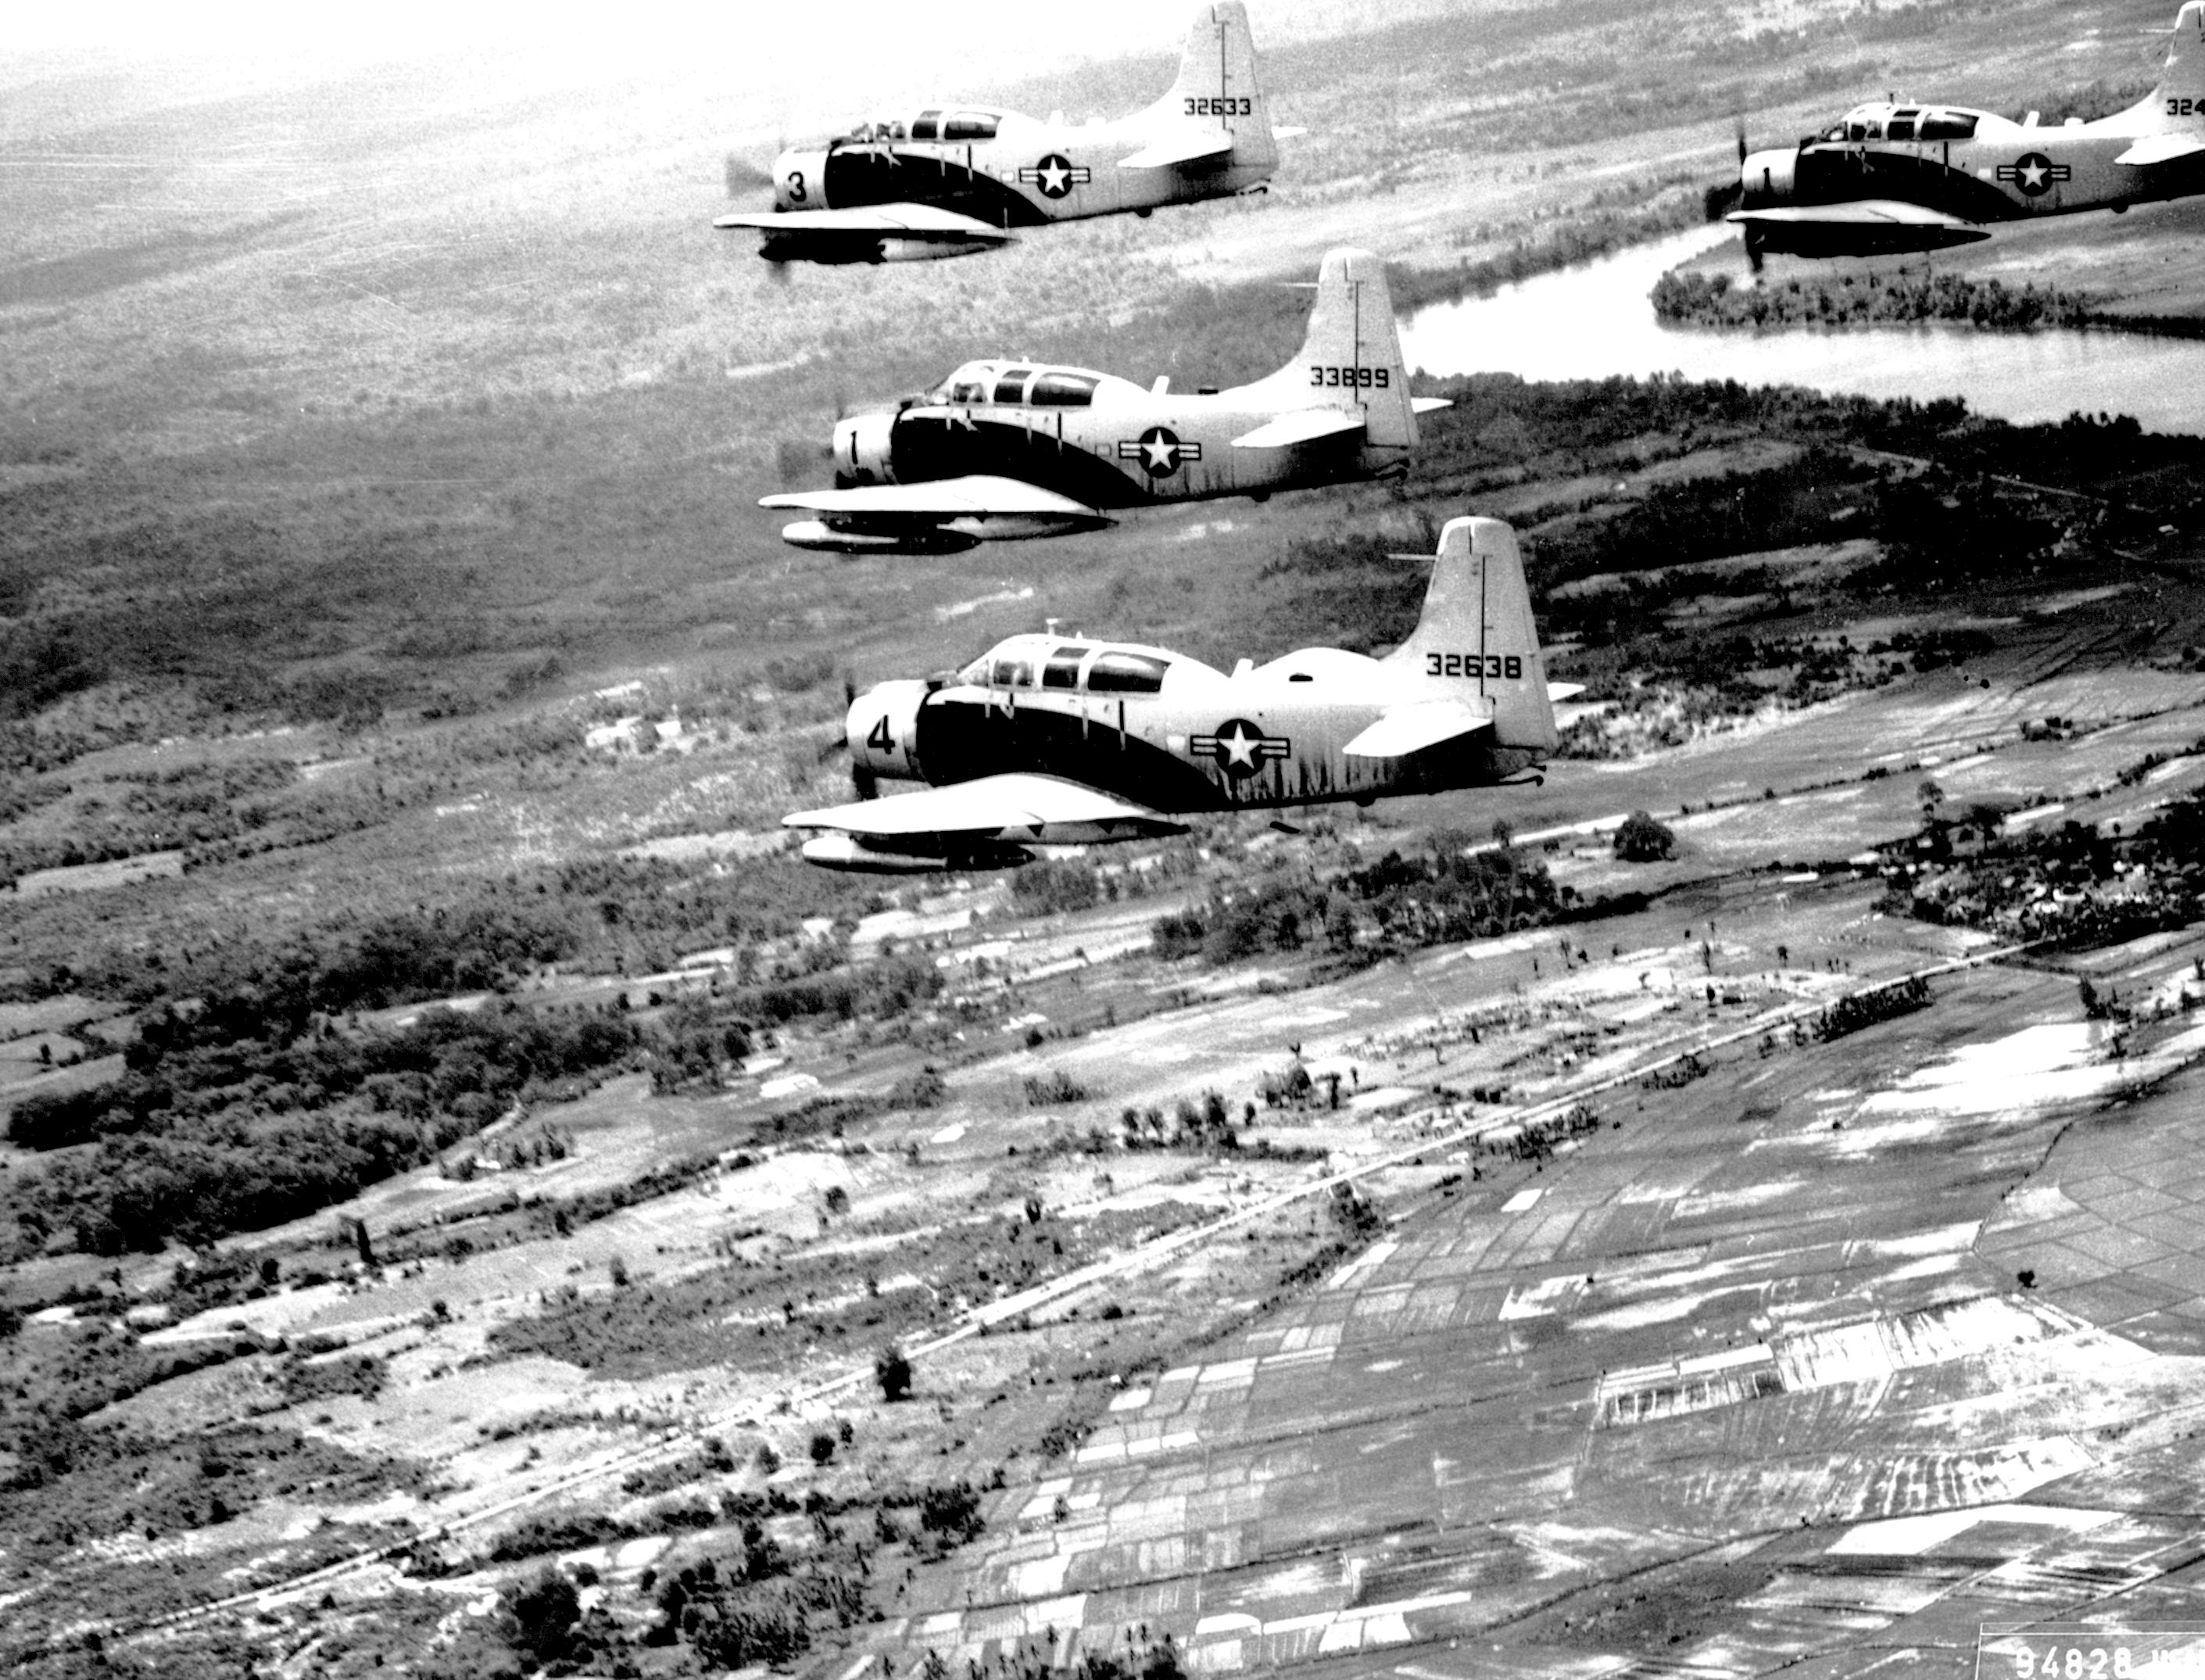 Douglas A-1 Skyraider | Military Wiki | FANDOM powered by Wikia